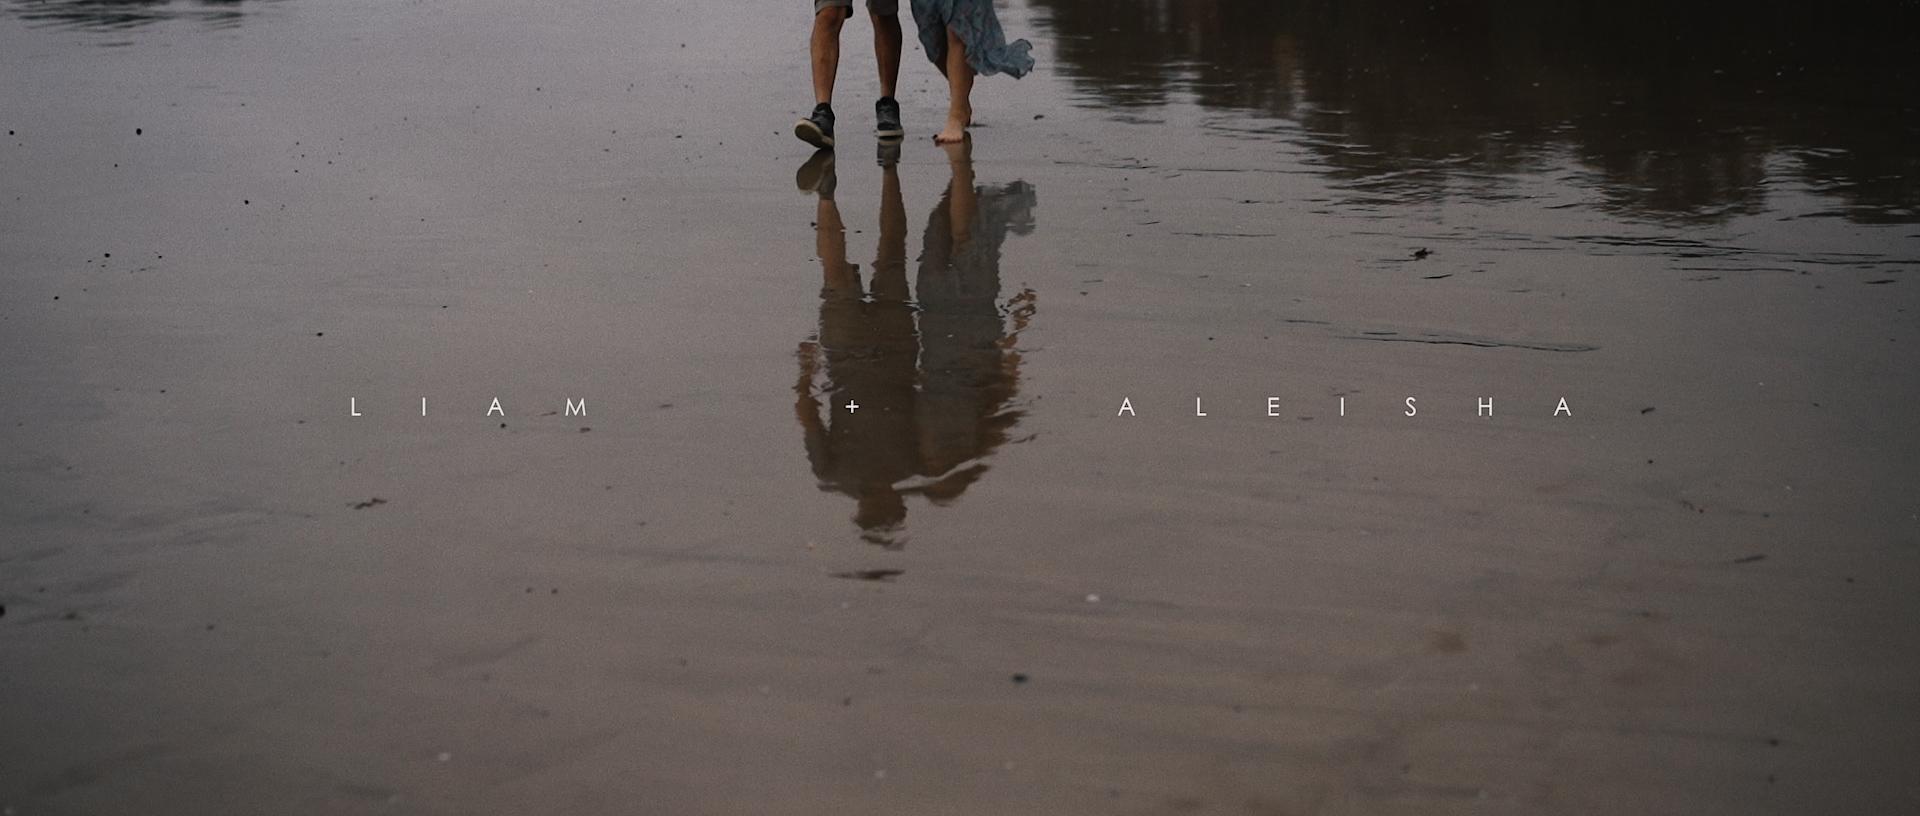 Liam + Aleisha | Auckland, New Zealand | Tawharanui Lodge